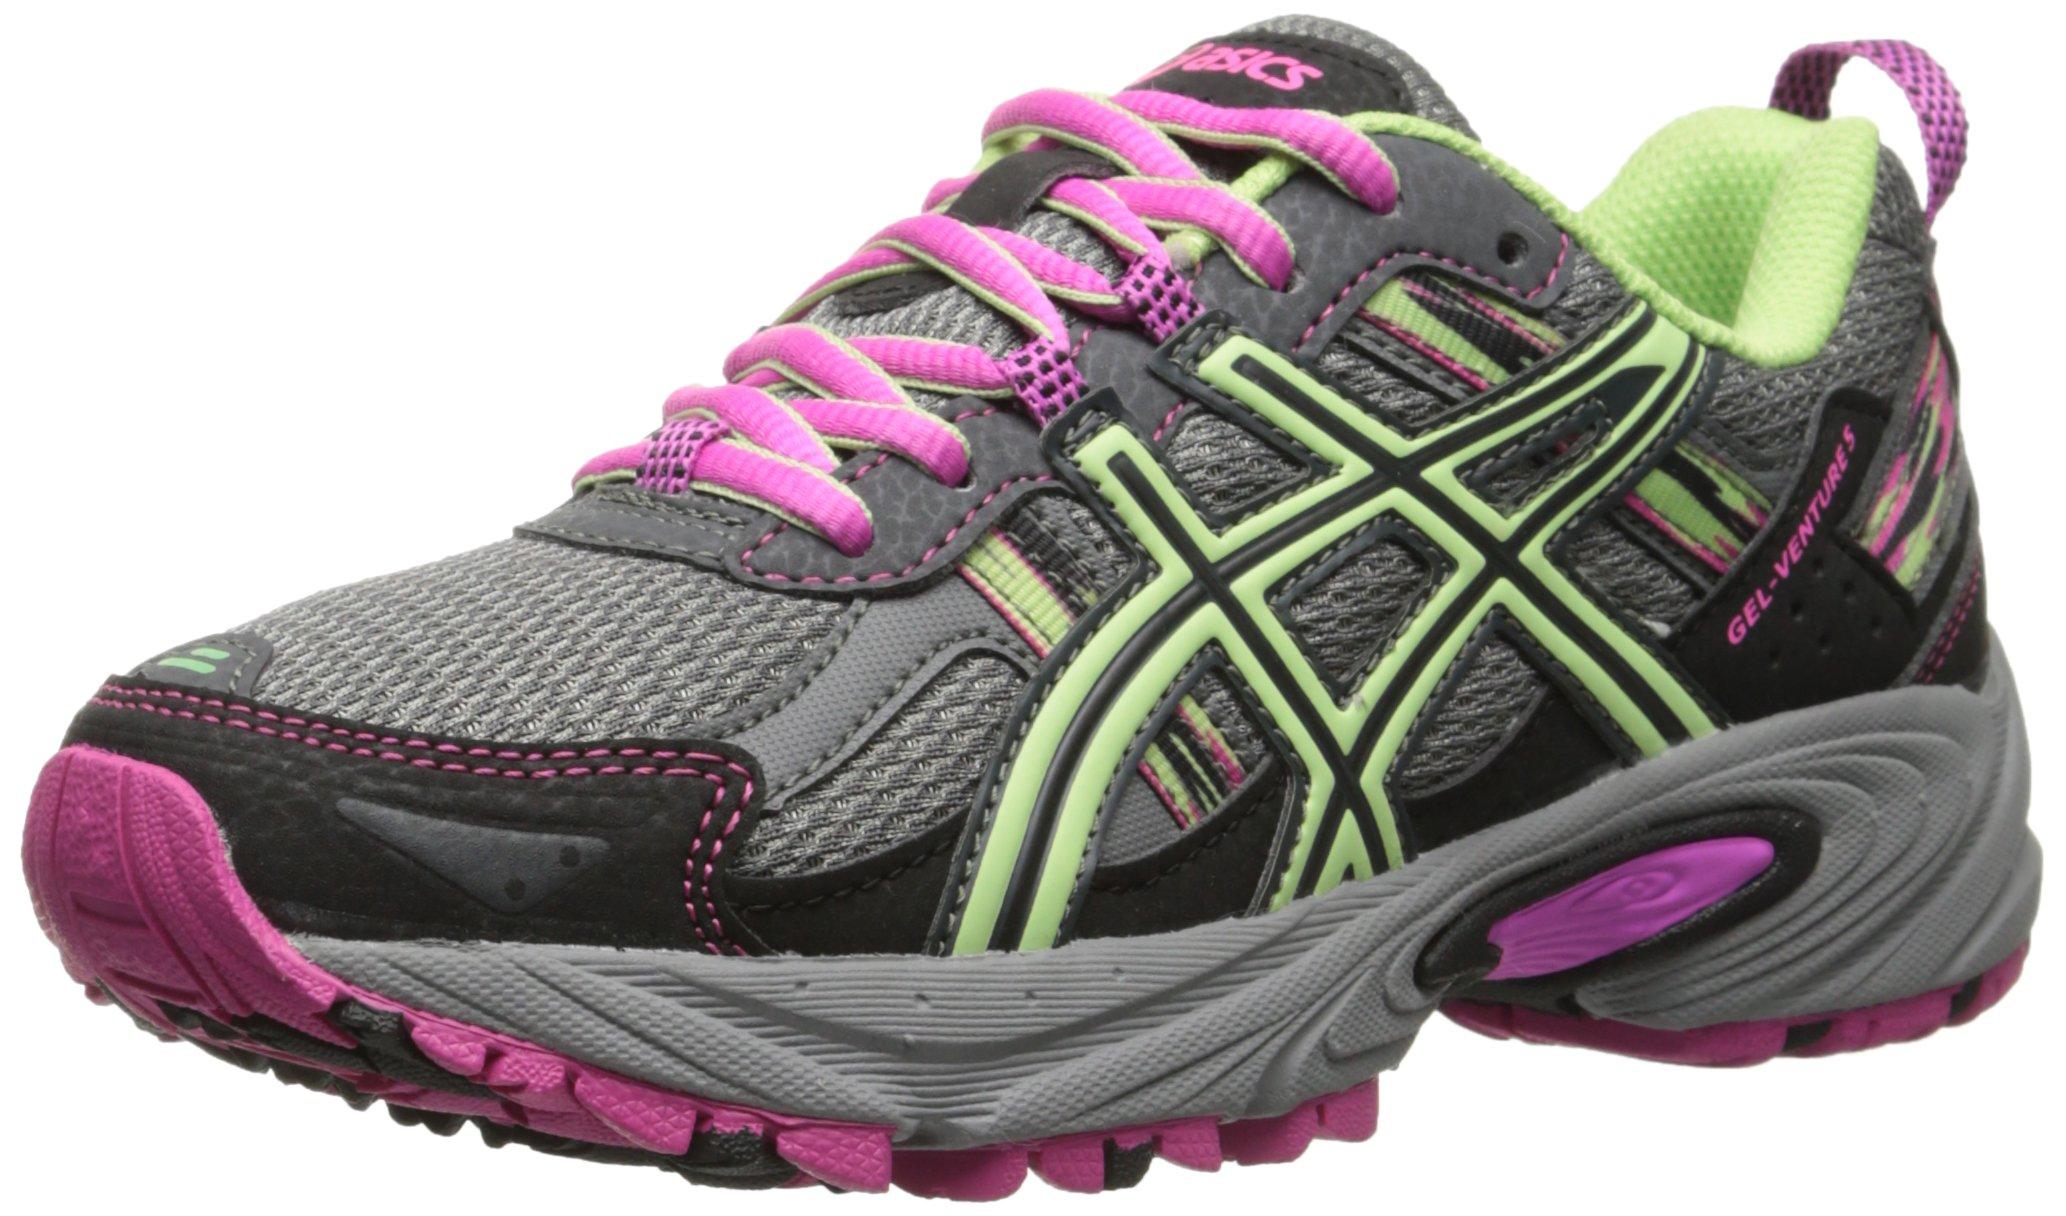 ASICS Women's Gel-venture 5 Running Shoe, Titanium/Pistachio/Pink Glow, 10 M US by ASICS